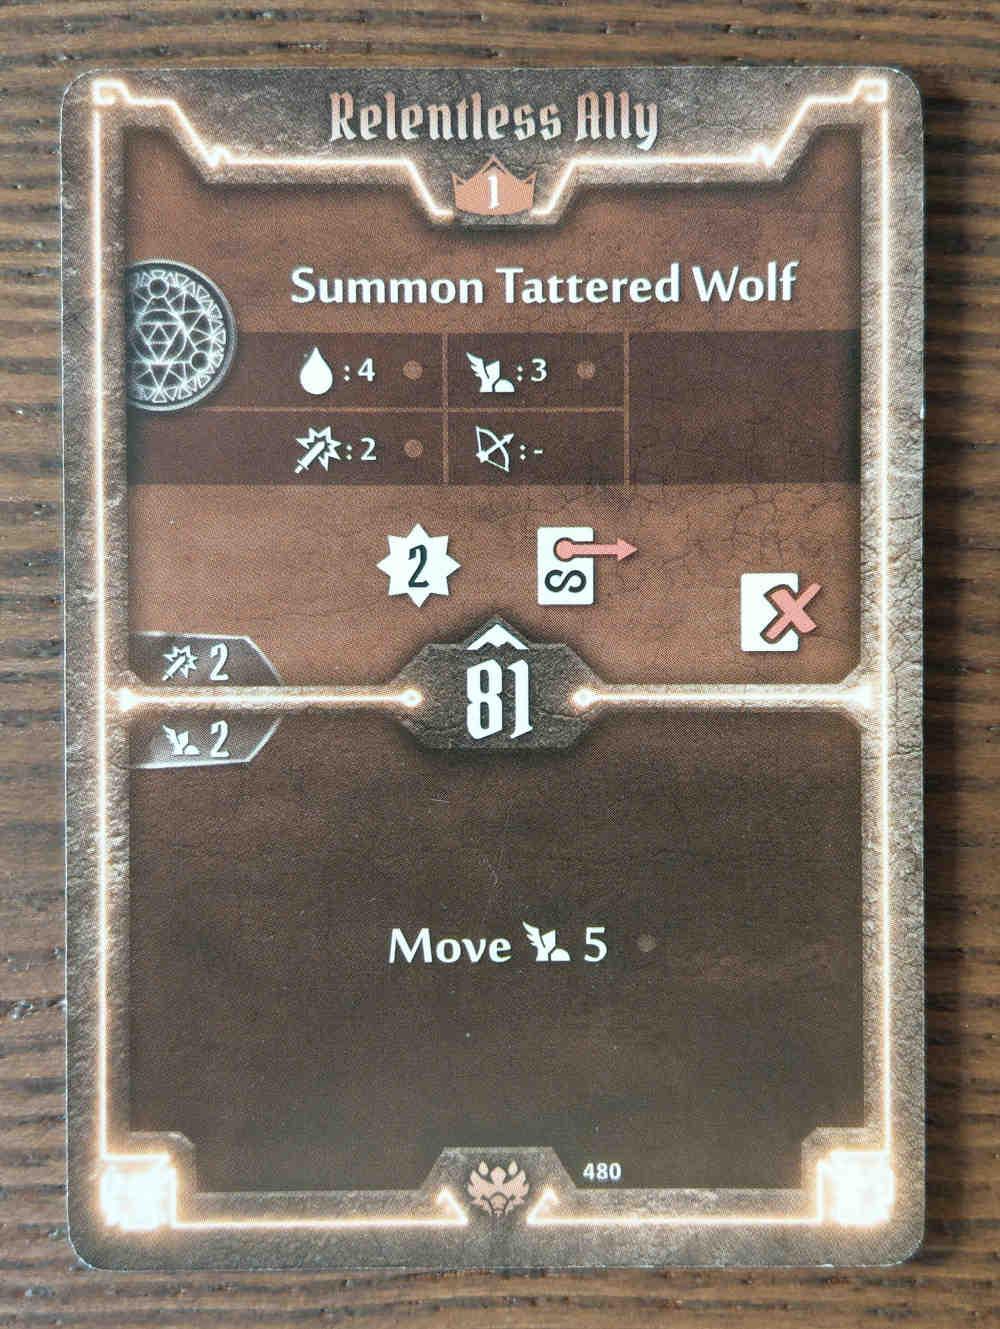 Beast Tyrant card Relentless Ally